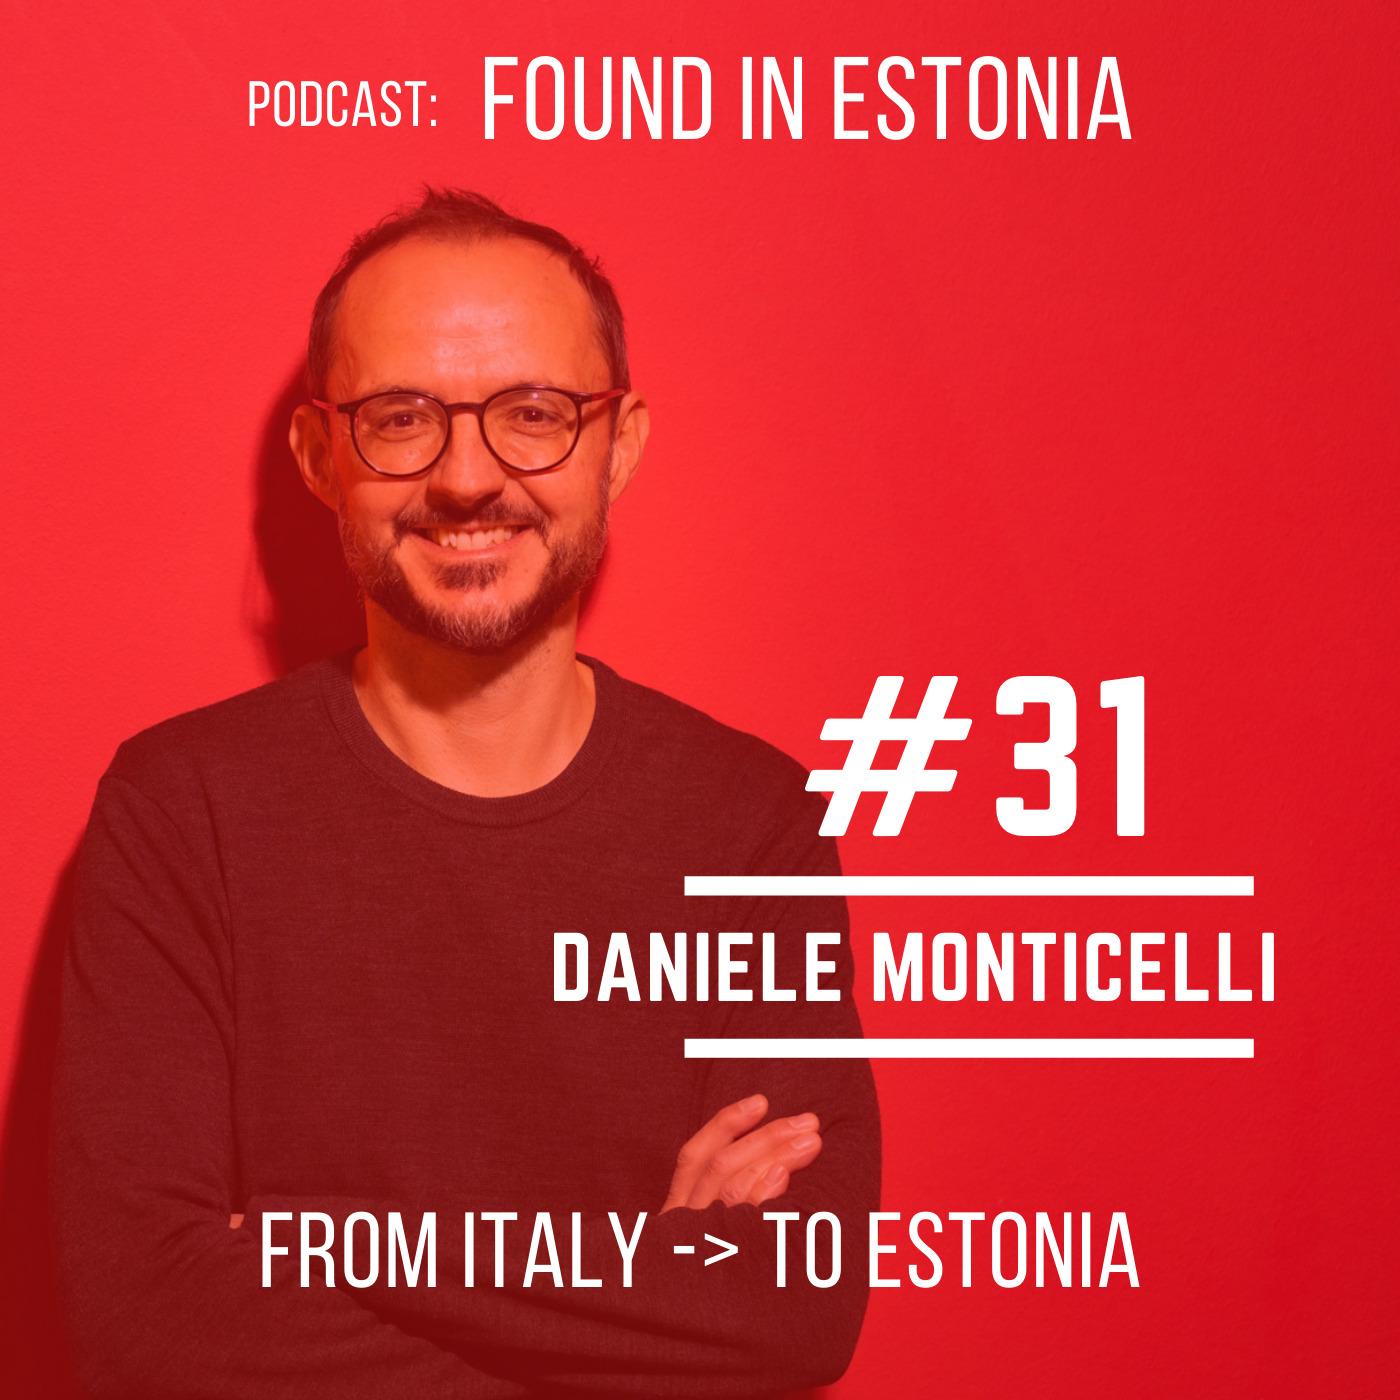 #31 Daniele Monticelli from Italy to Estonia